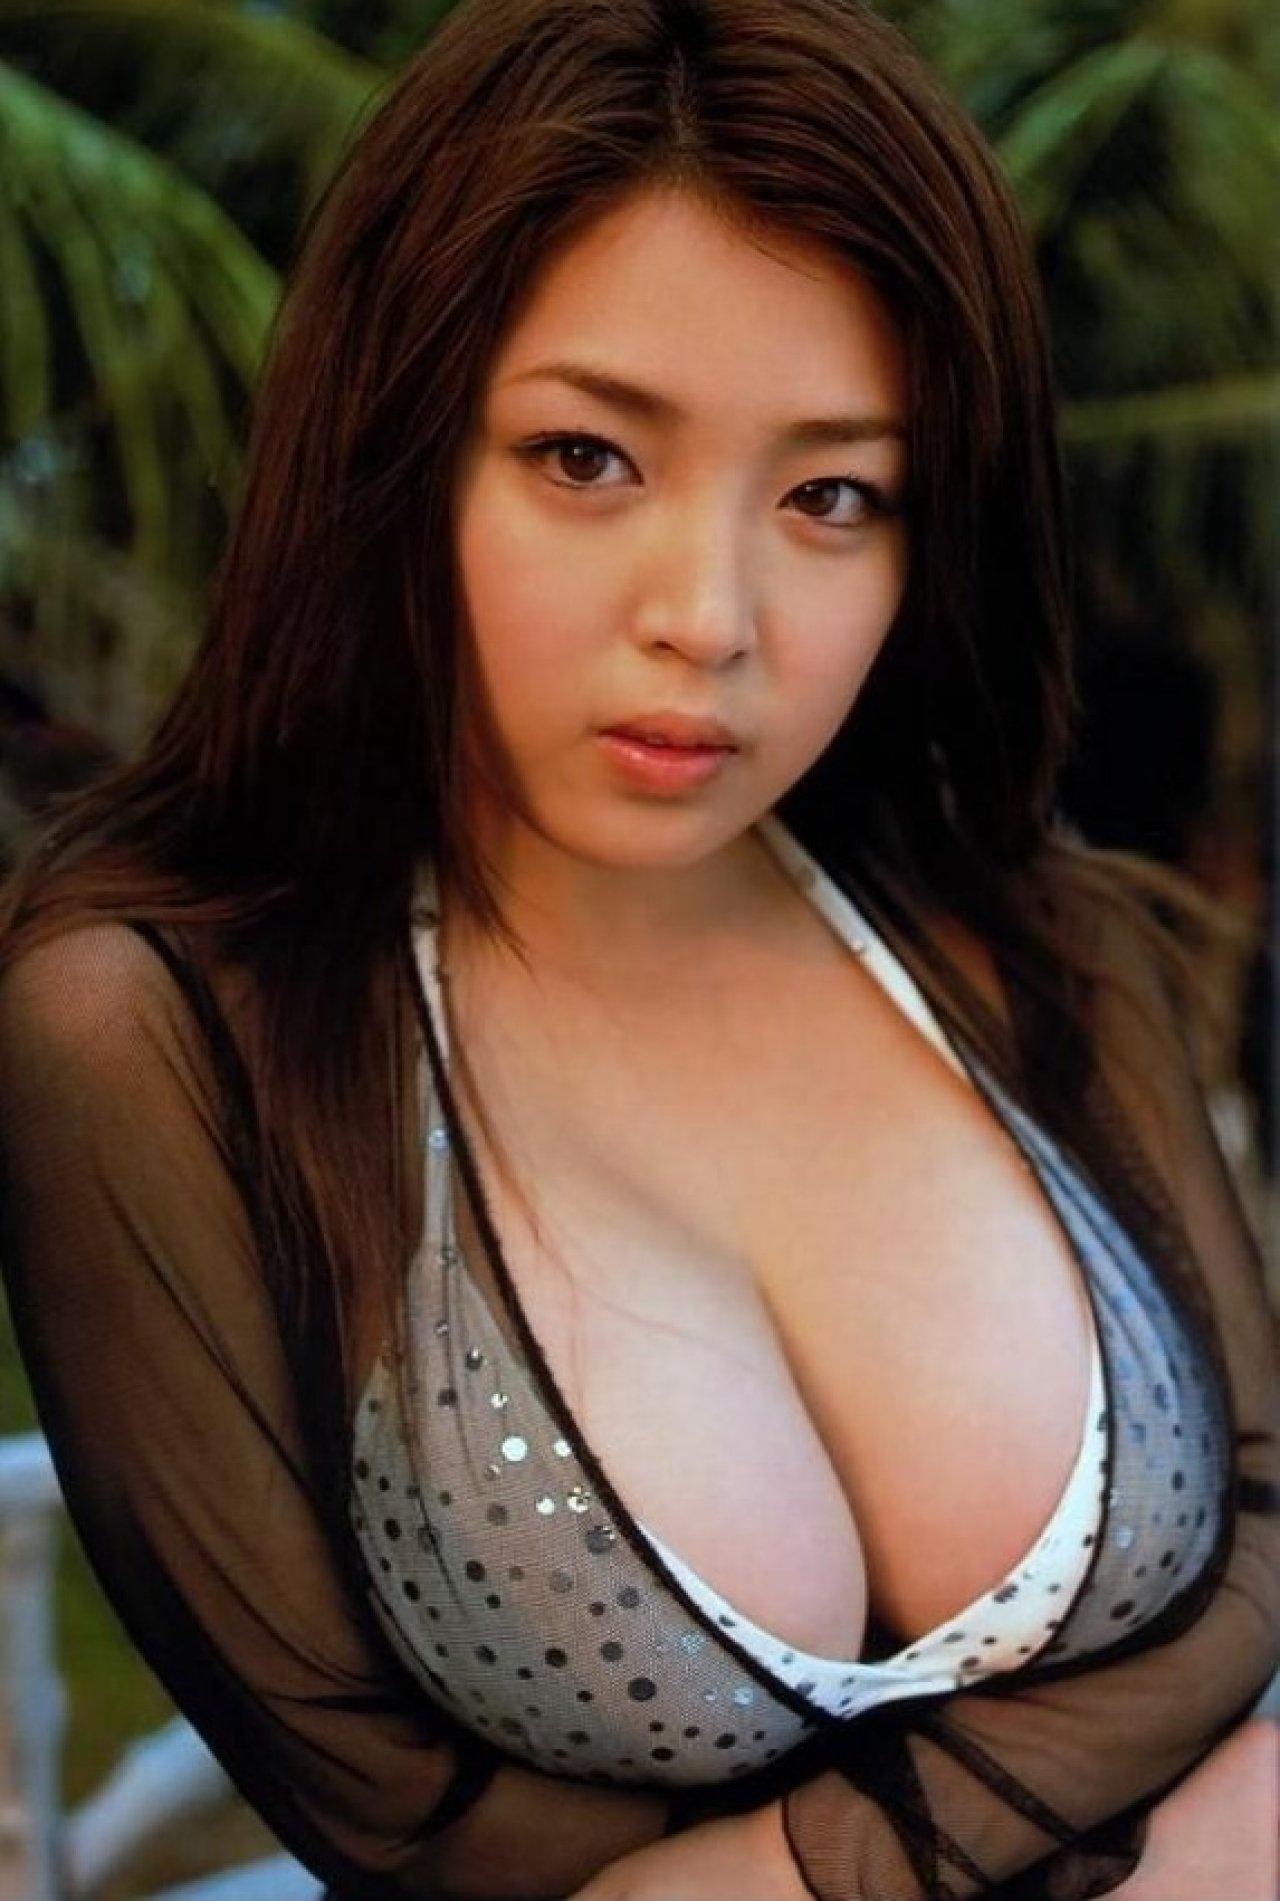 Big boob girls gallery